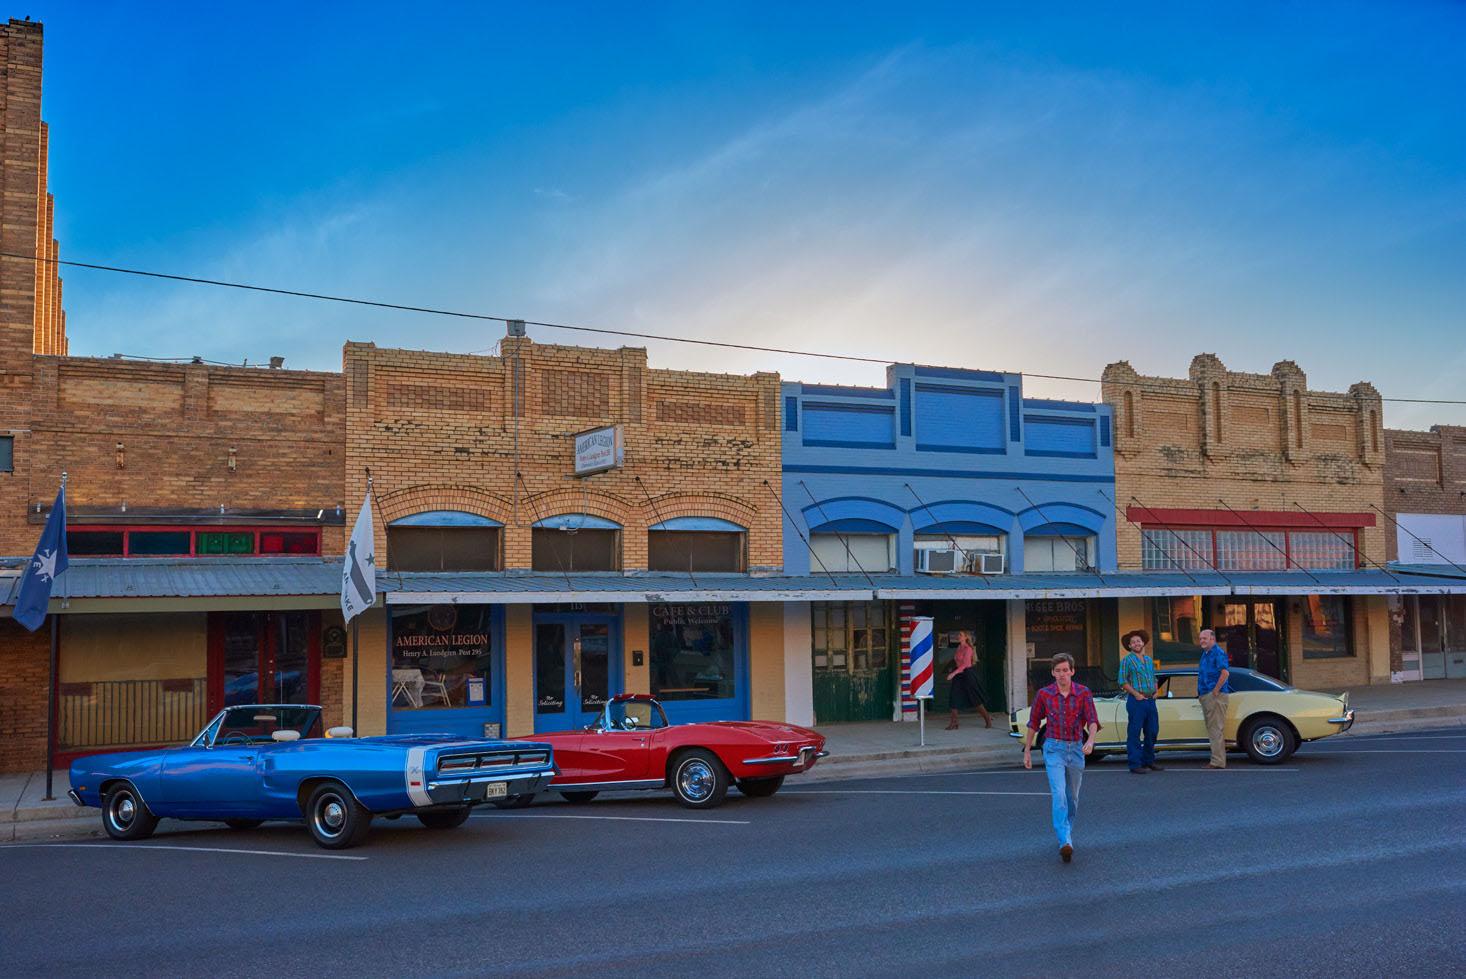 NIGHT-OF-THE-HUNTED-Texas-3.jpg